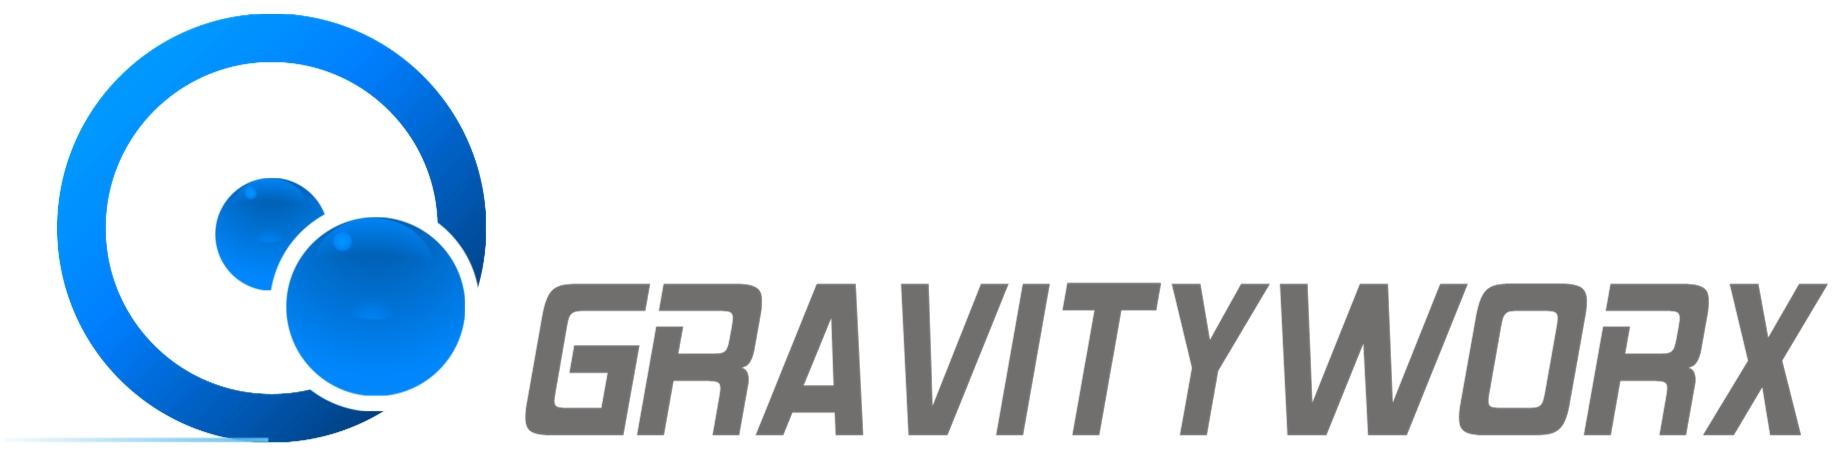 GravityWorx Store